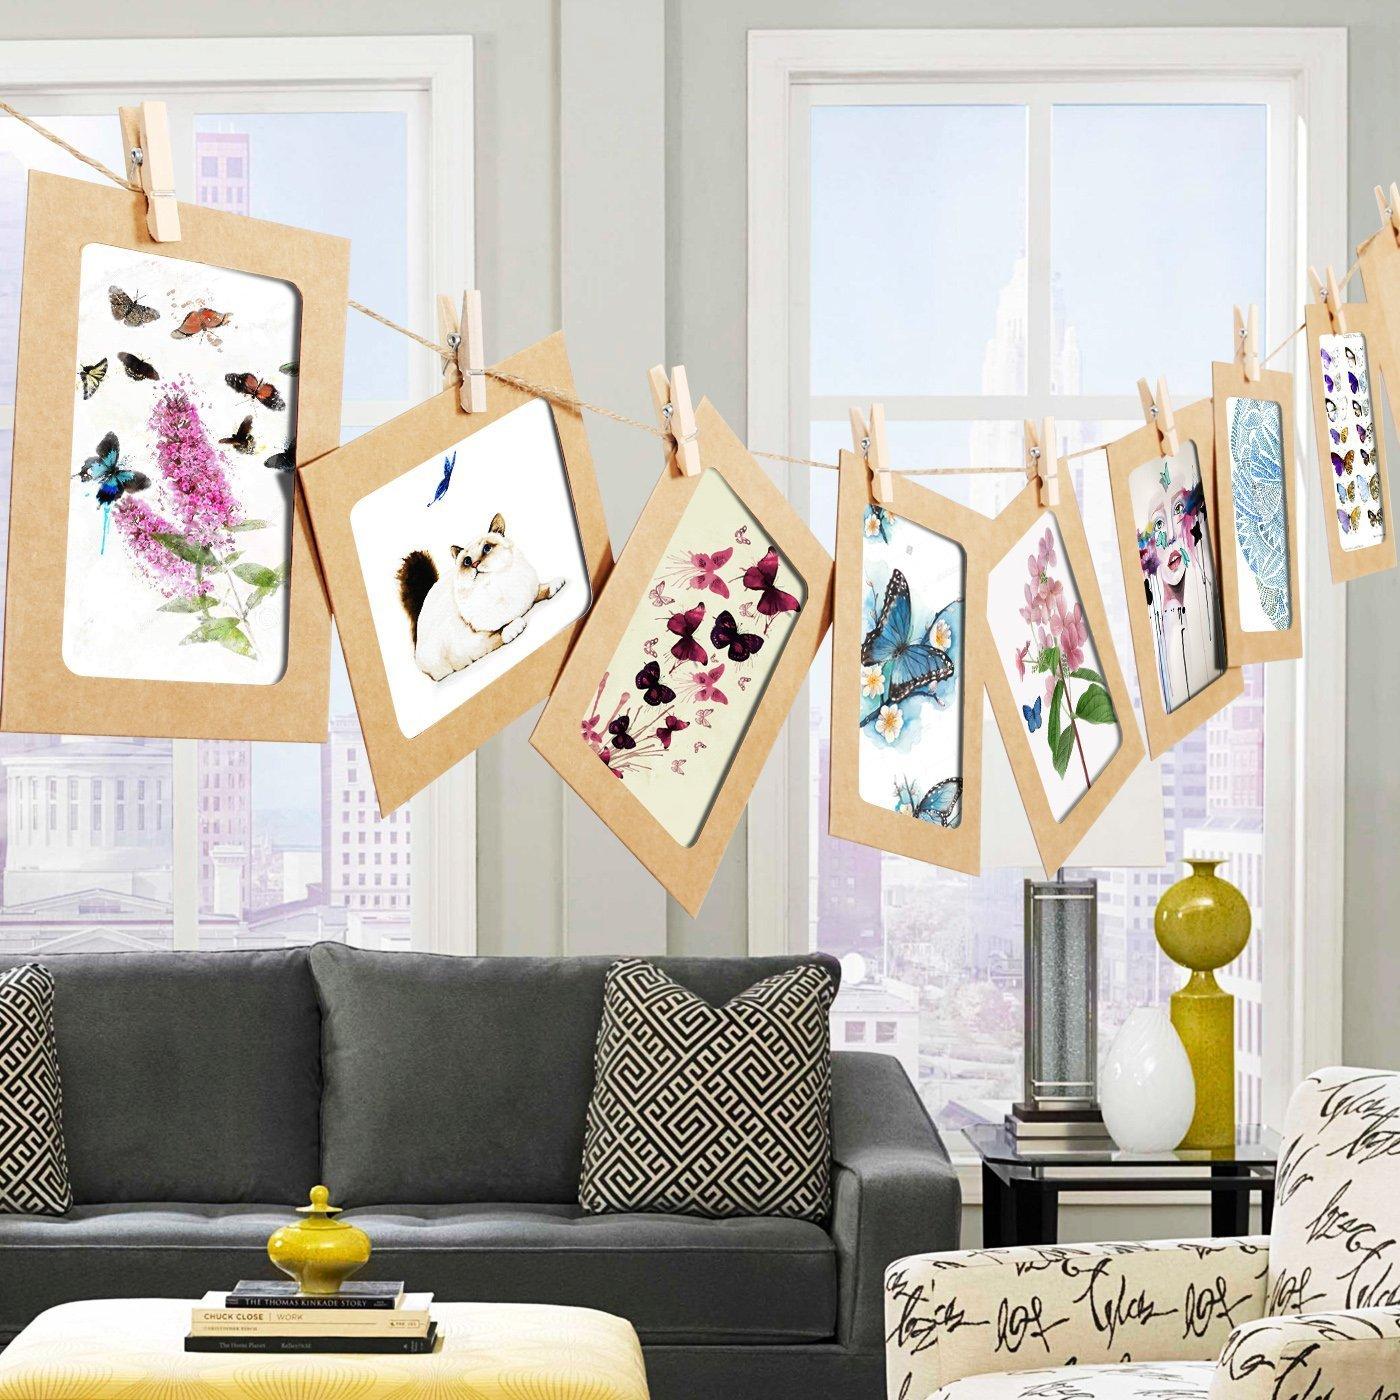 30Pcs DIY Kraft Paper Photo Frame Wall Decor 30pcs Kraft Paper Frame,Fits 5x7,4x6,3x5Photo,Brown,Black,White Insert Paper Picture Holder for Hanging Artworks Prints Christmas Home Decorations